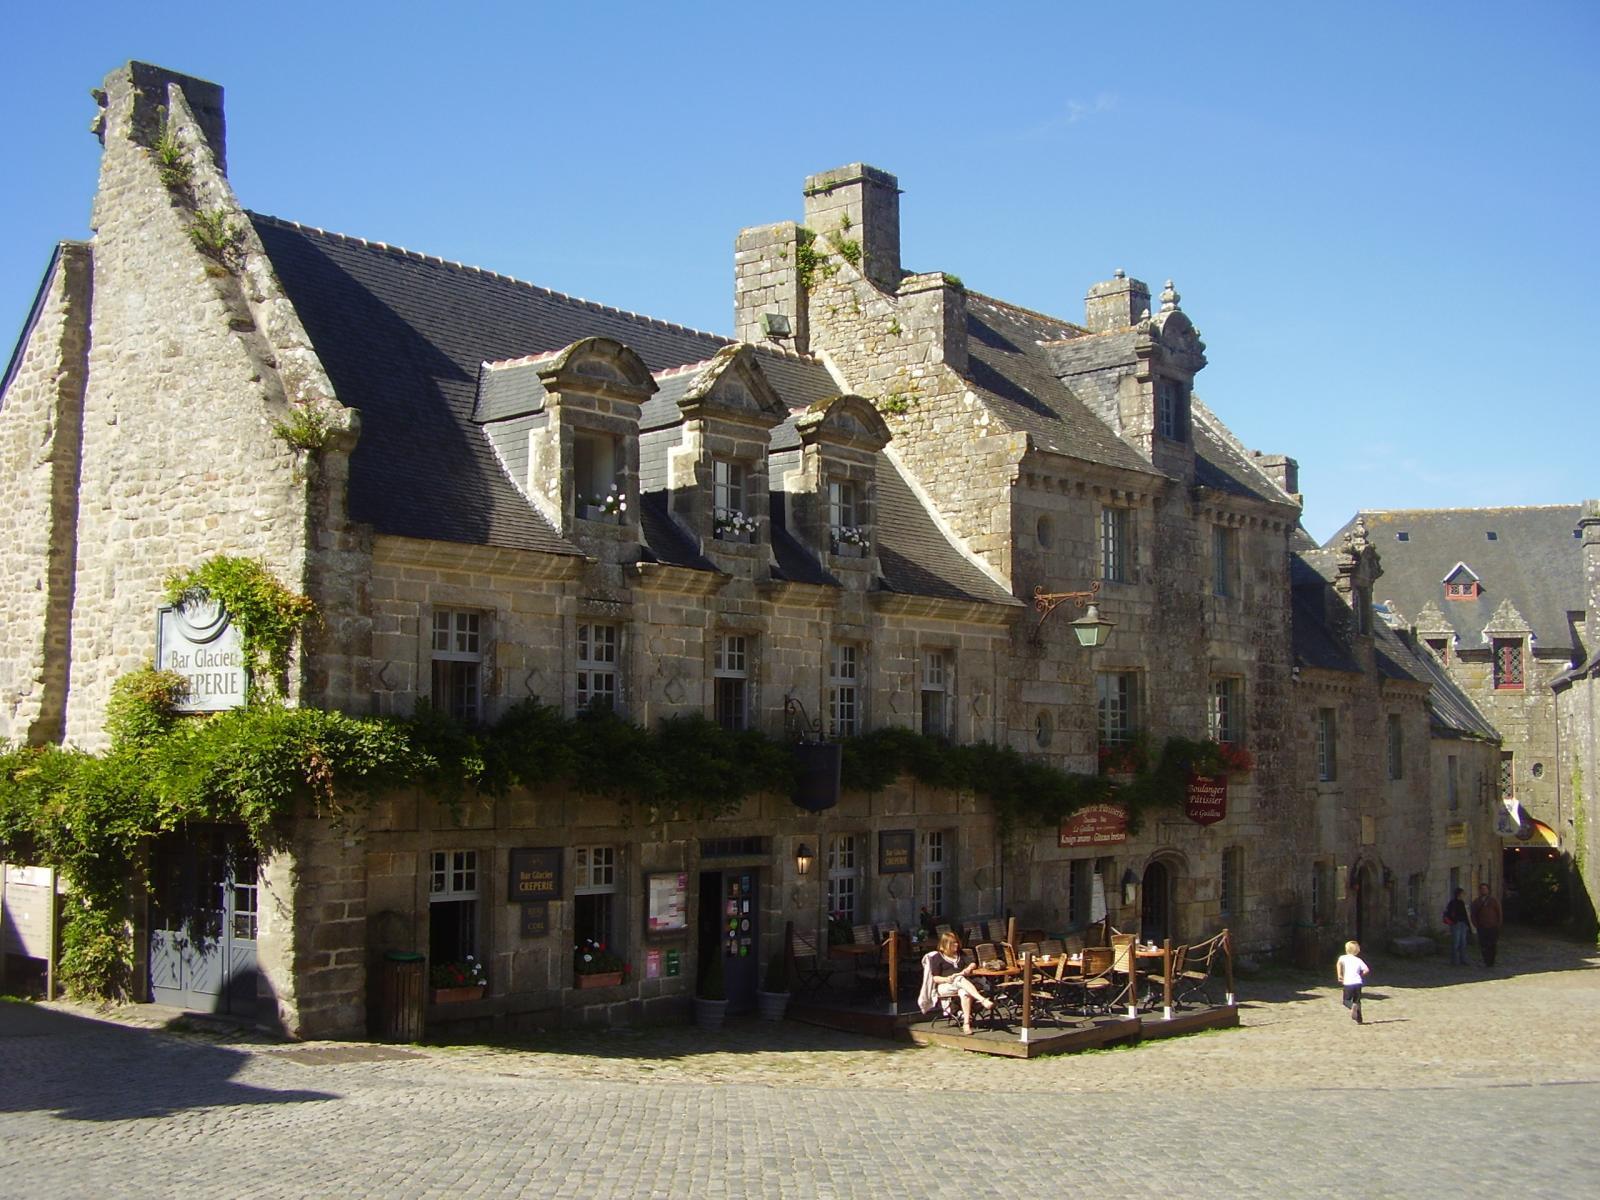 Image : Place de Locronan